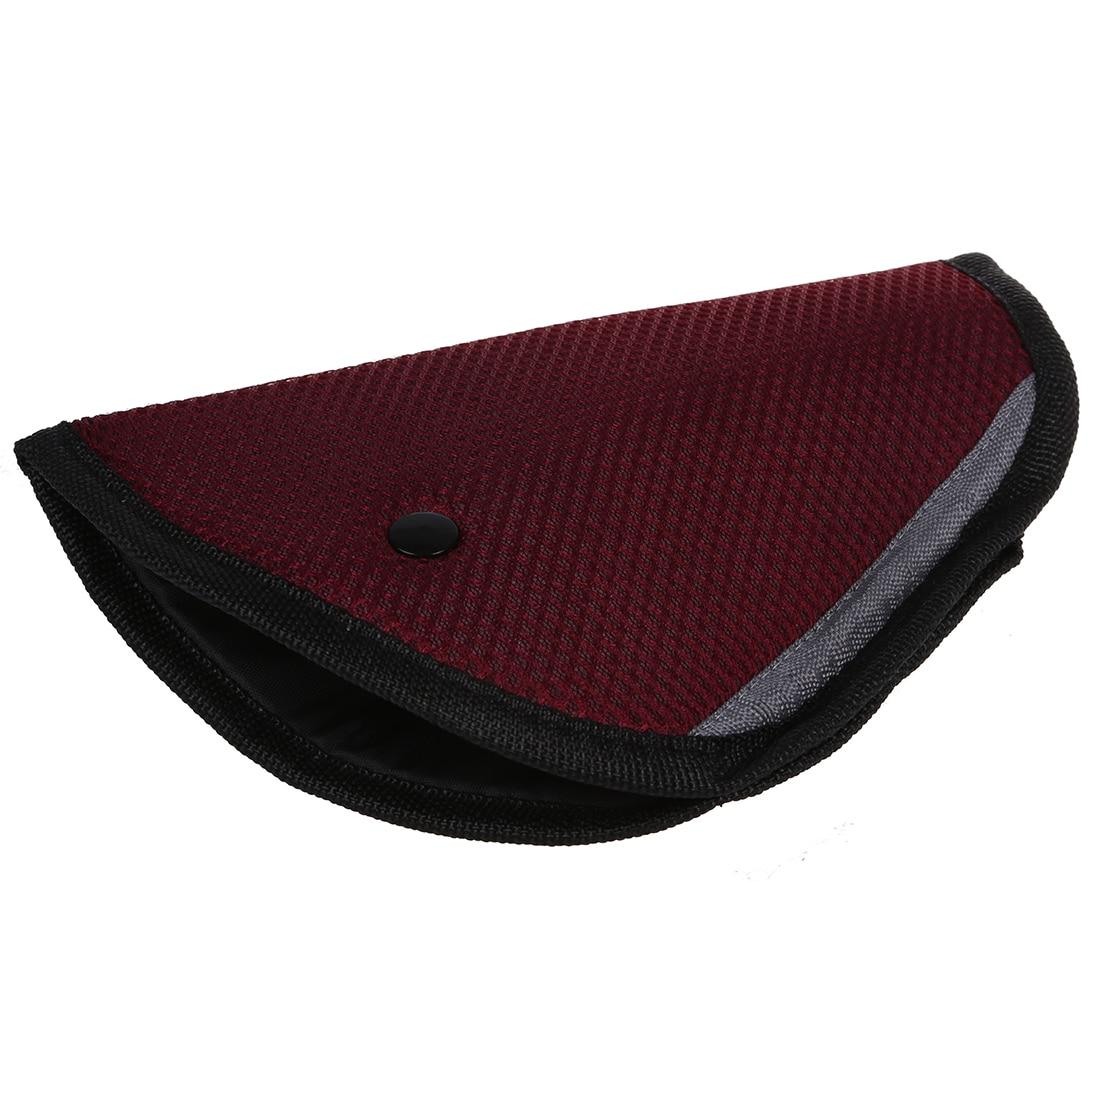 Car Accessories Comfortable Child Car Seat Belt Holder Claret